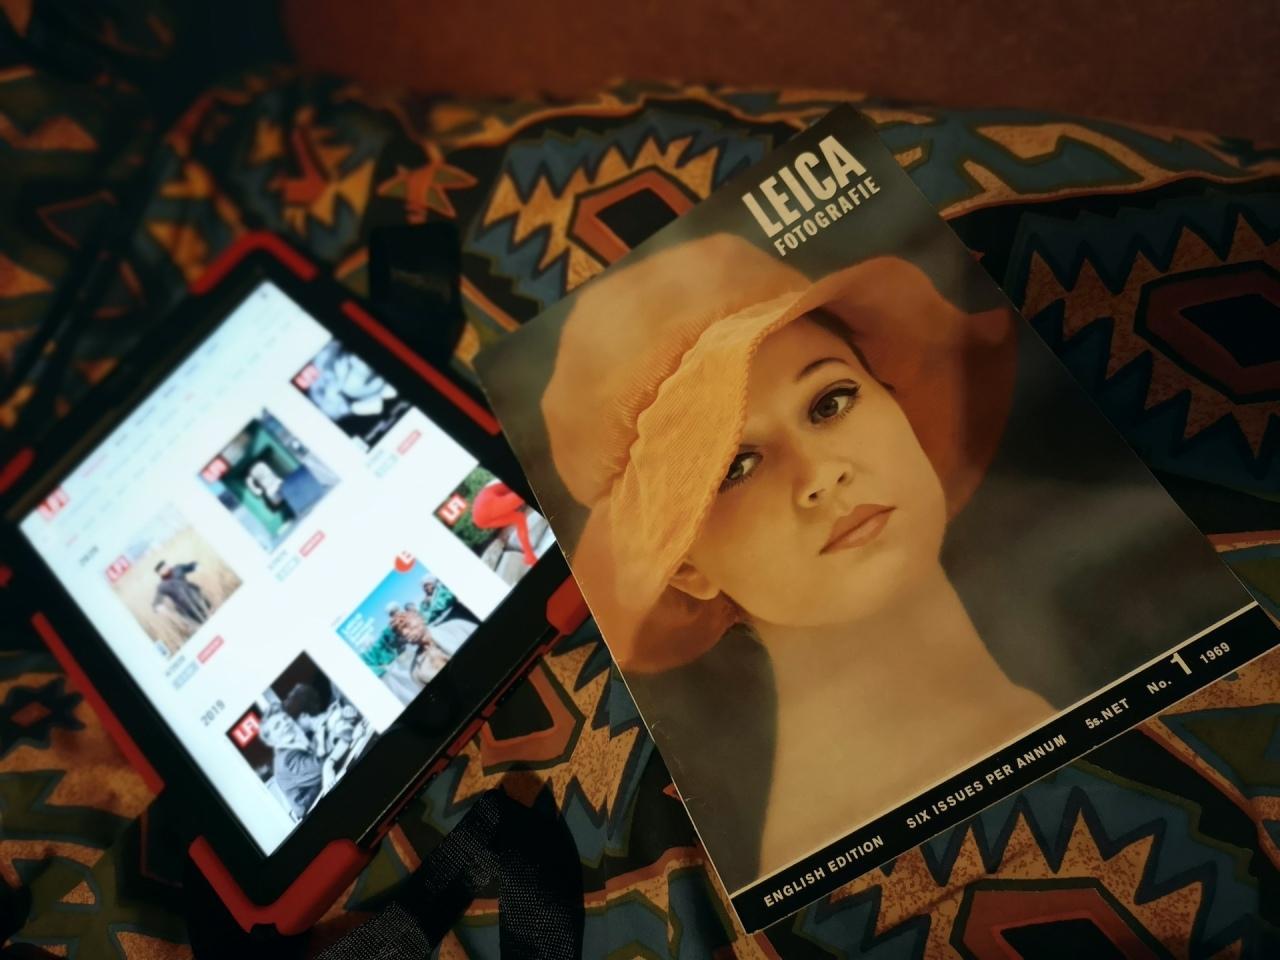 Leica Magazine